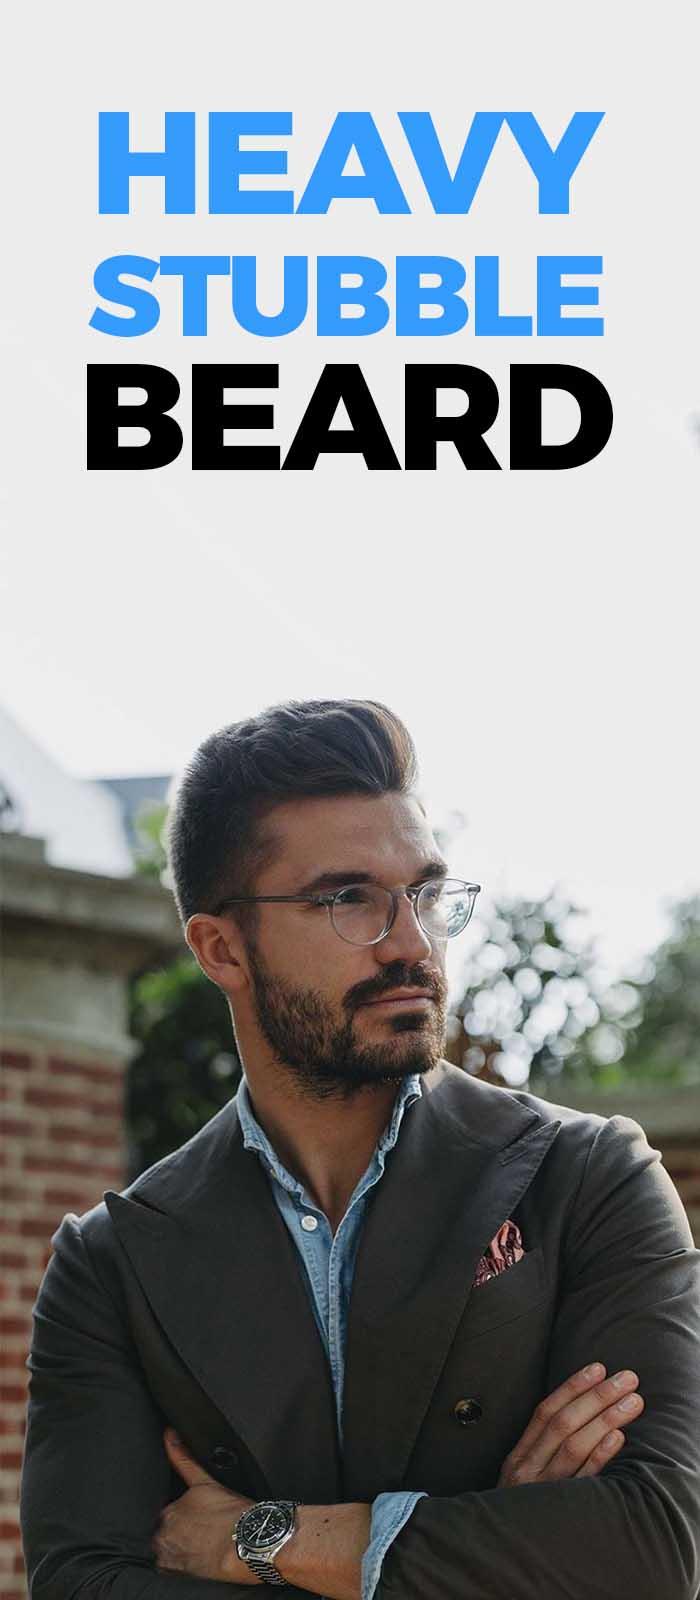 Heavy Stubble Beard.